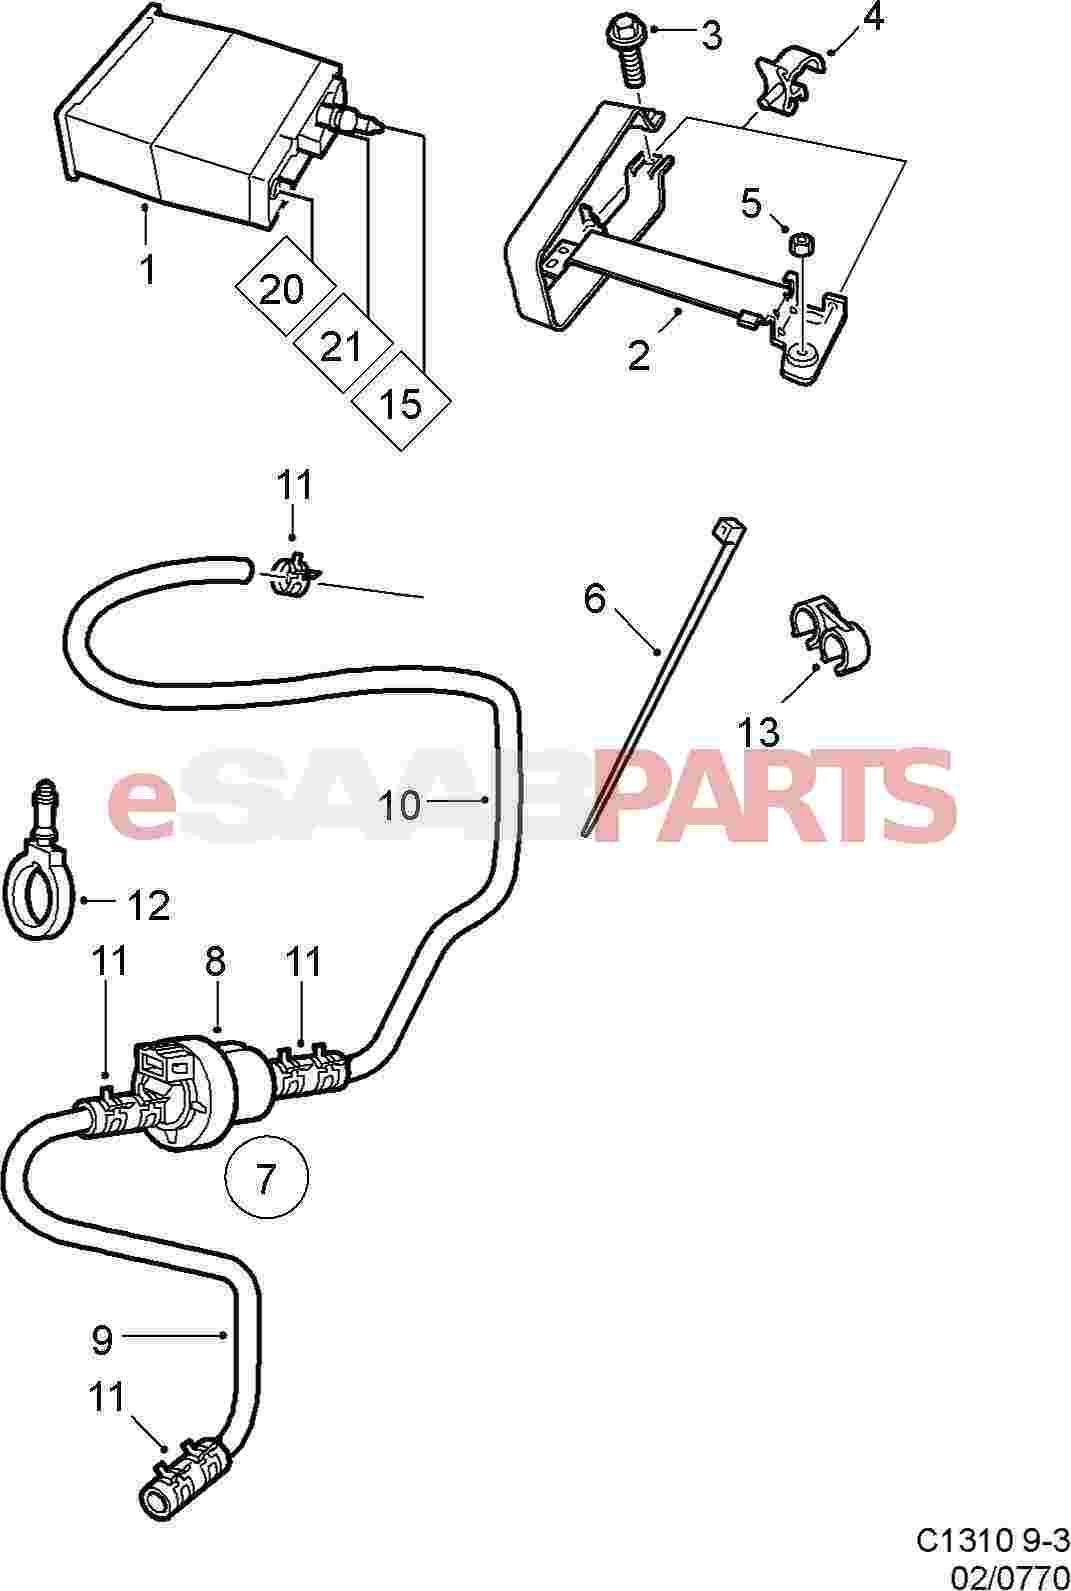 4442471  saab evap canister purge valve